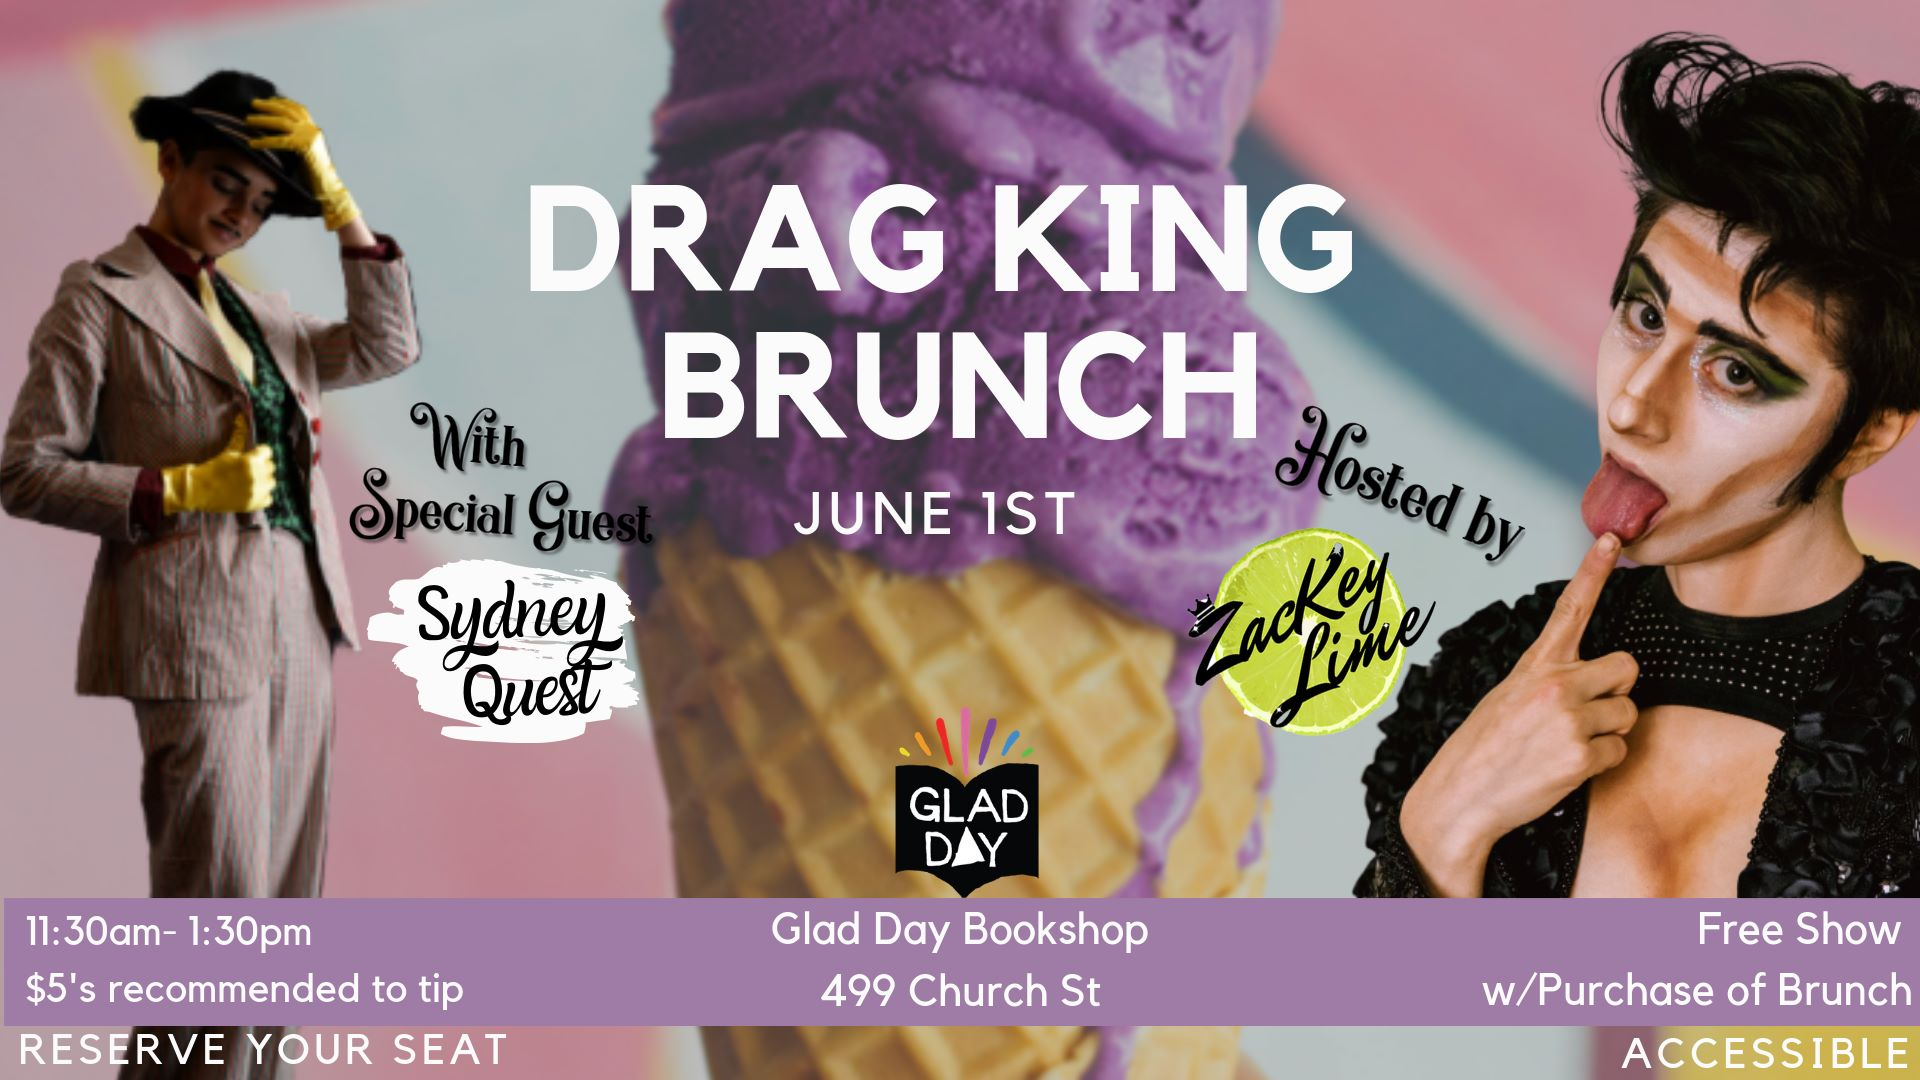 Drag-King-Brunch-June-1st